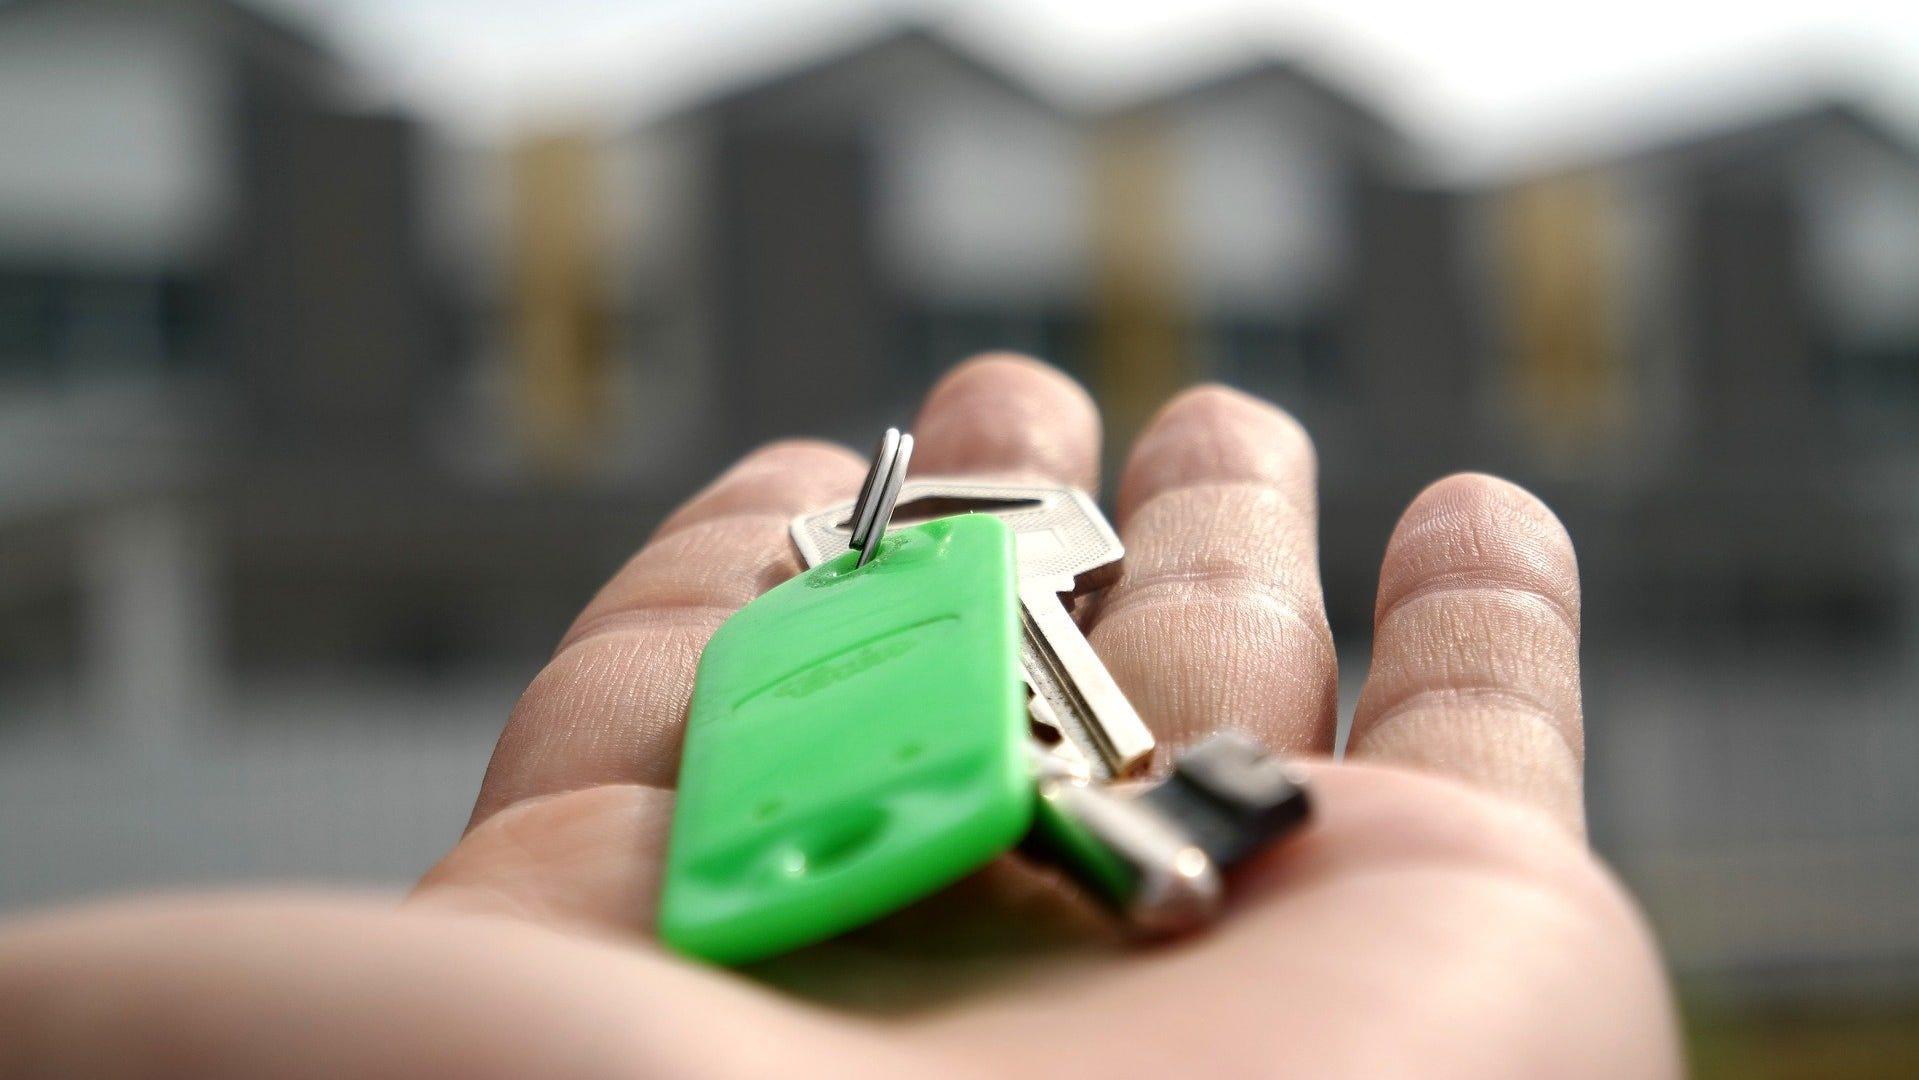 0ddfac48 2c1b 4b20 b45b bac525dadad2 Real Esate House buy jpg?crop=1919,1080,x0,y97&width=1919&height=1080&format=pjpg&auto=webp.